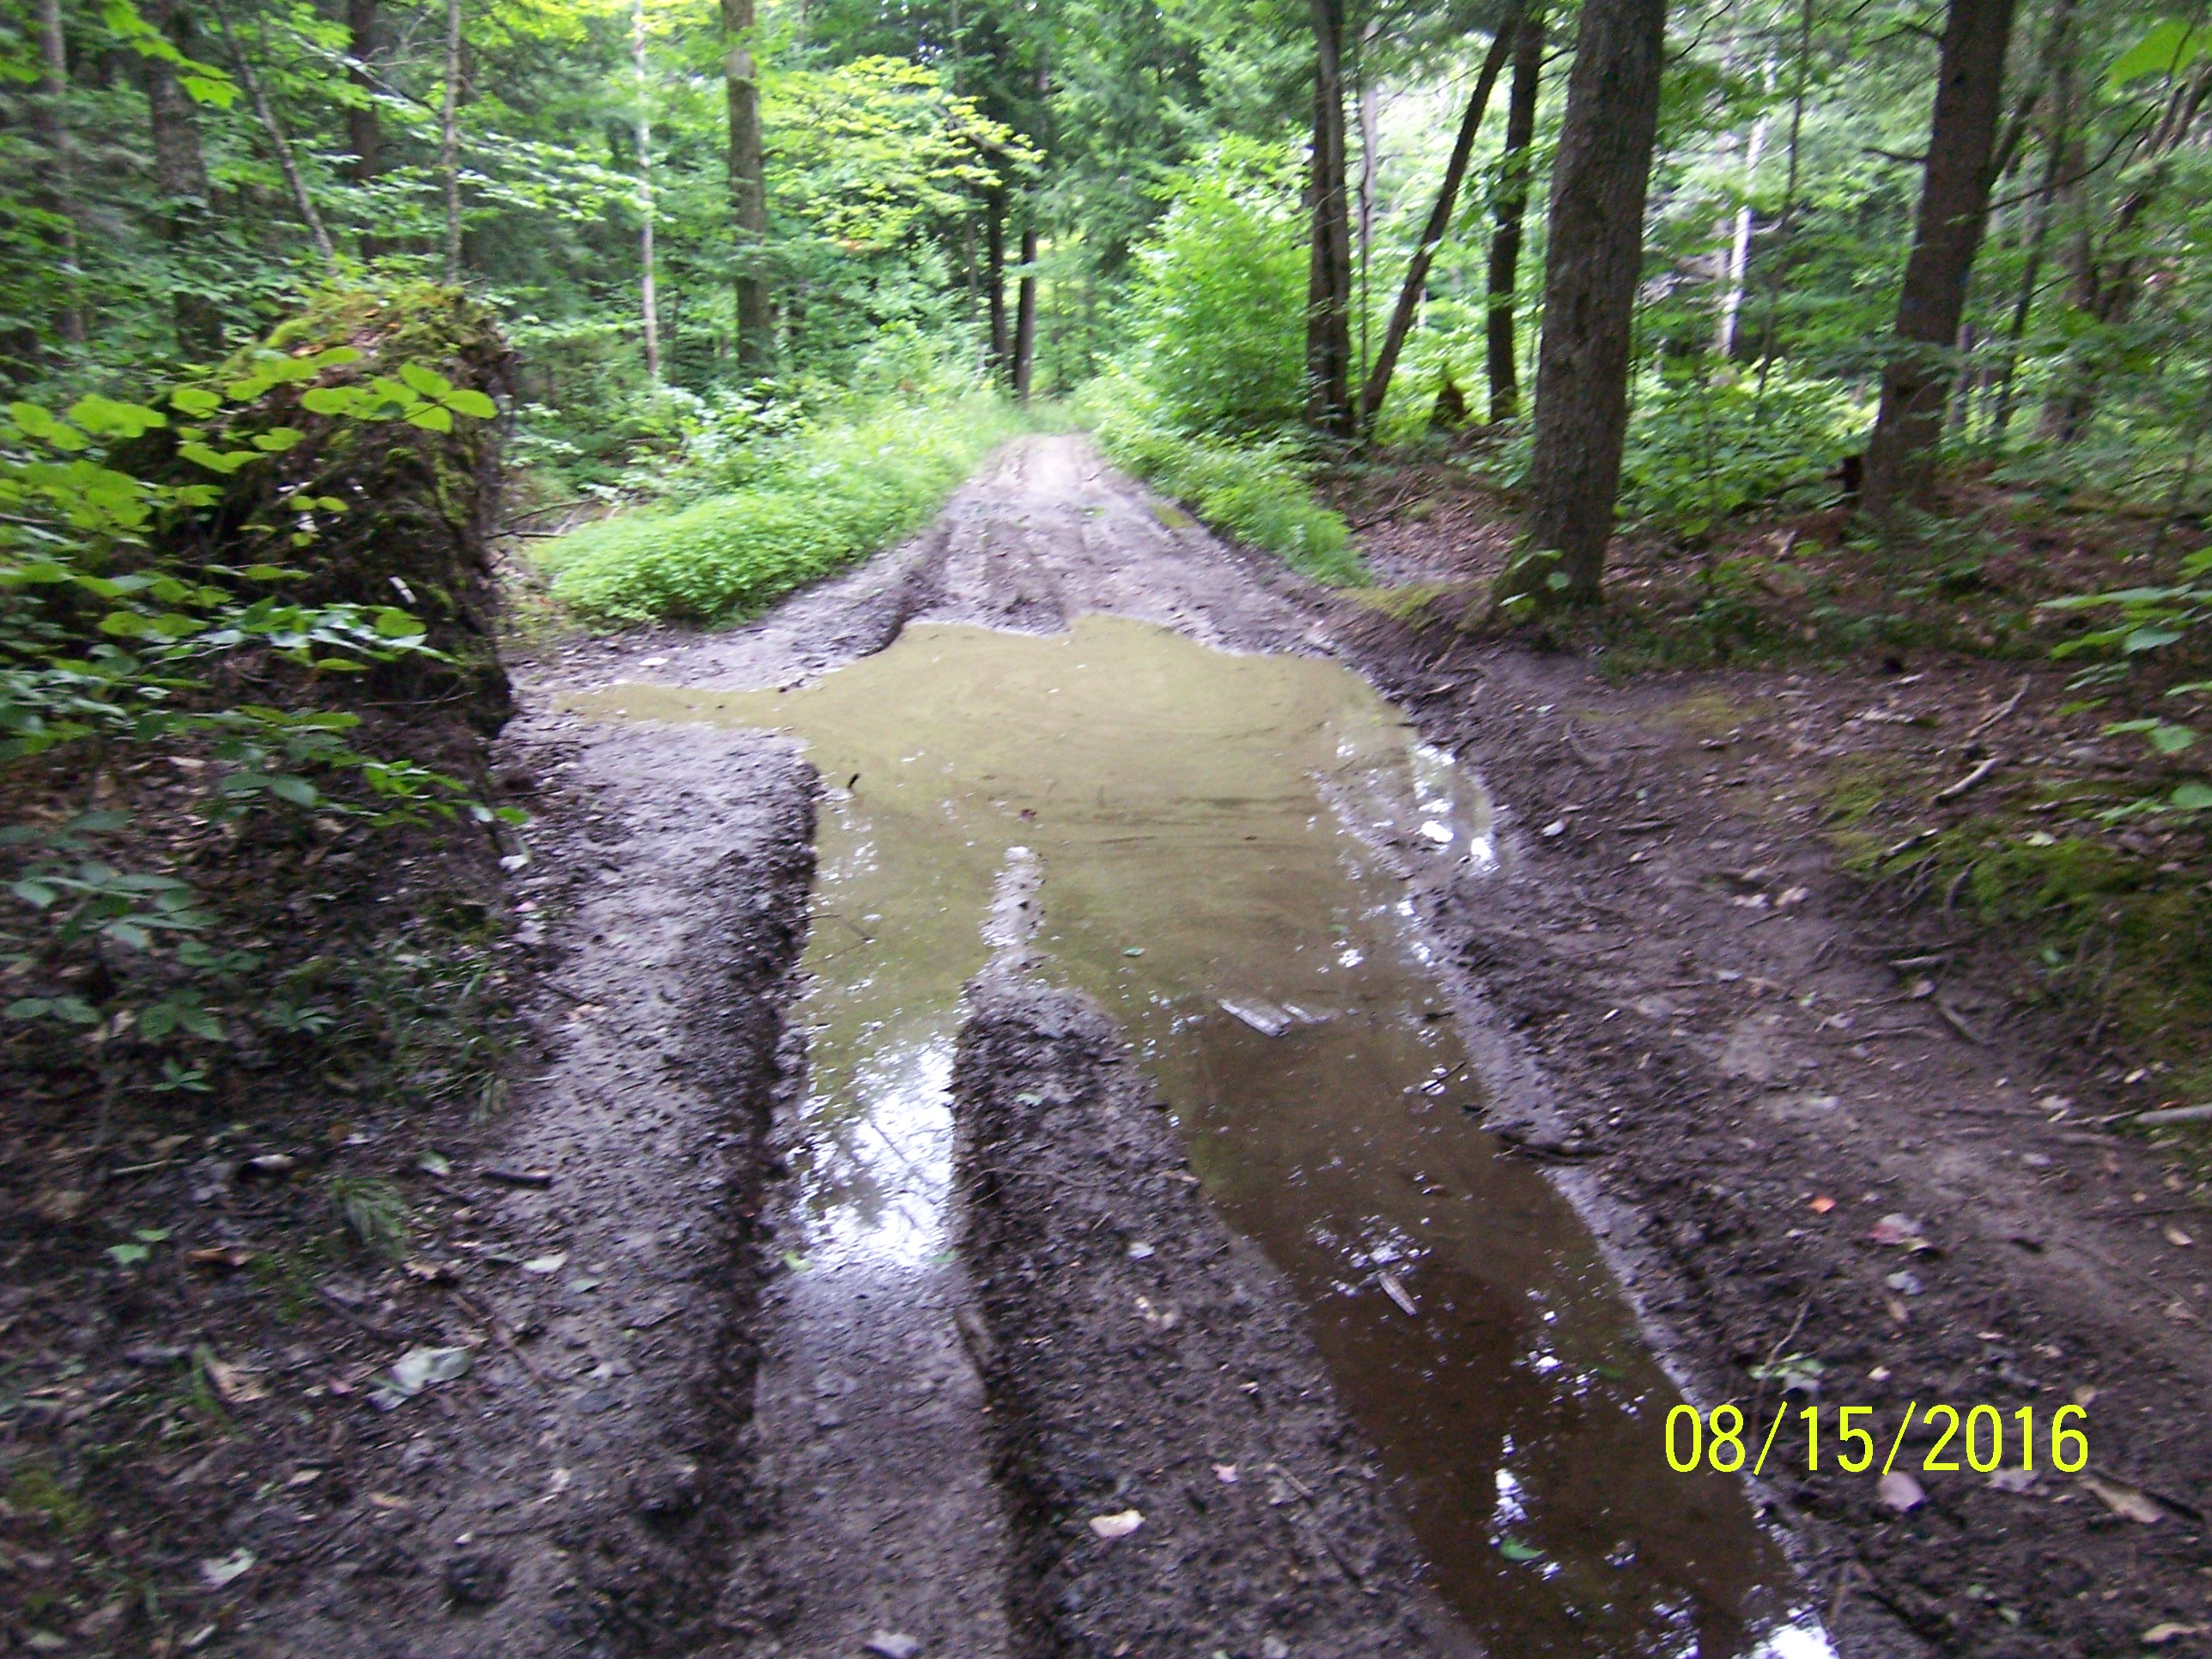 Long Trail 8 15 Nye S Green Valley Farm 4 Miles Hike Light Hike Happy